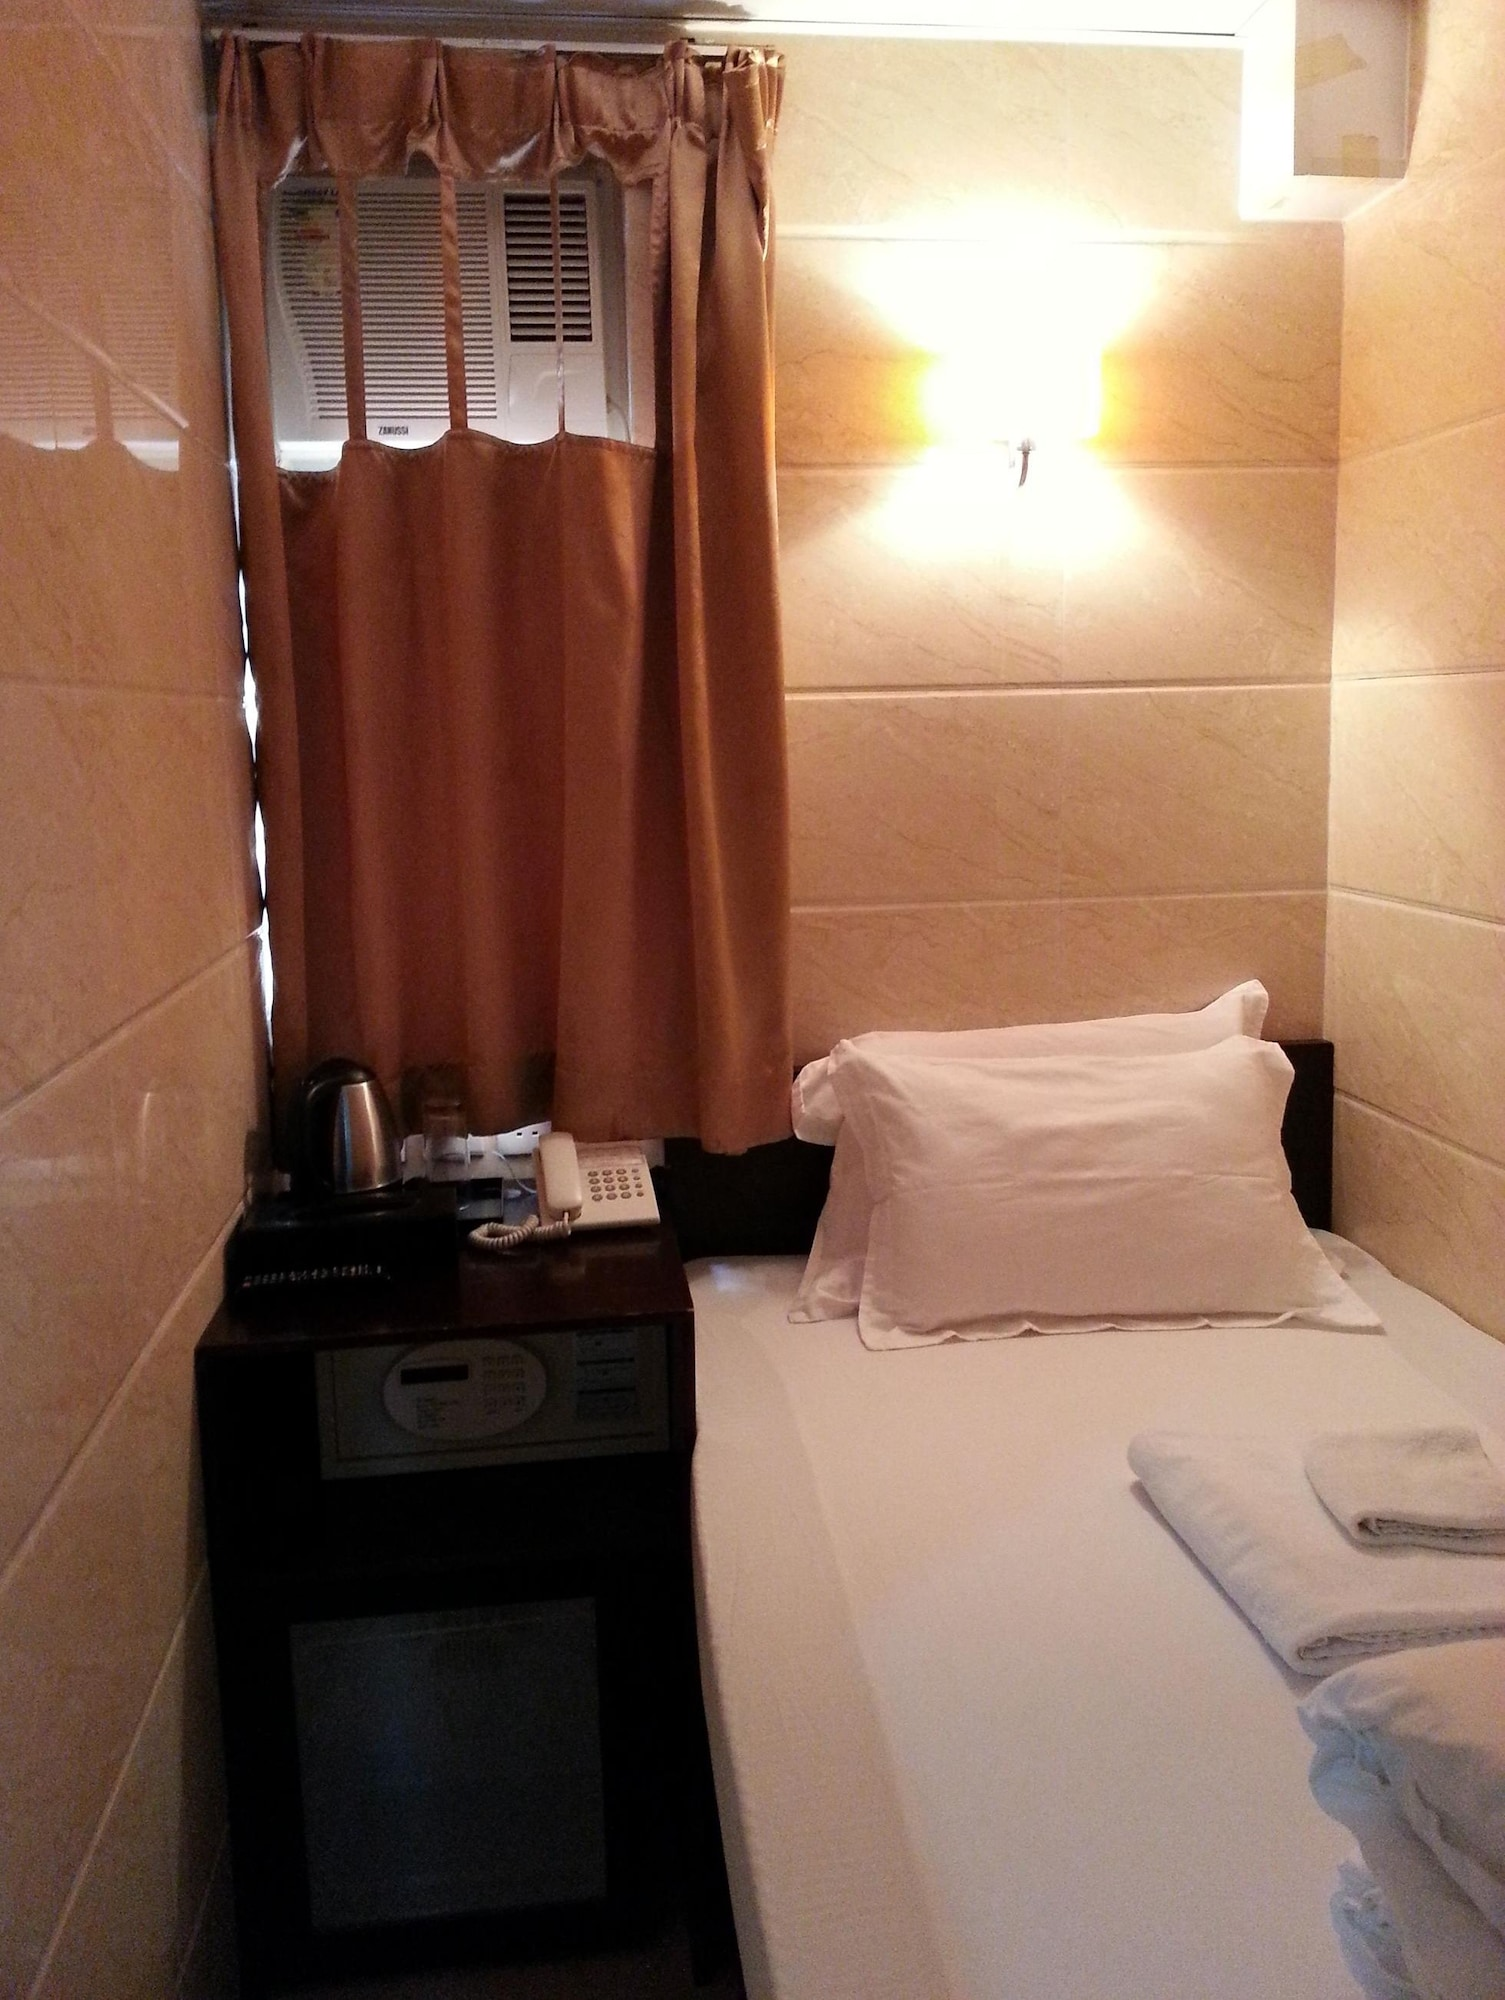 Comfort Guest House - Hostel, Yau Tsim Mong